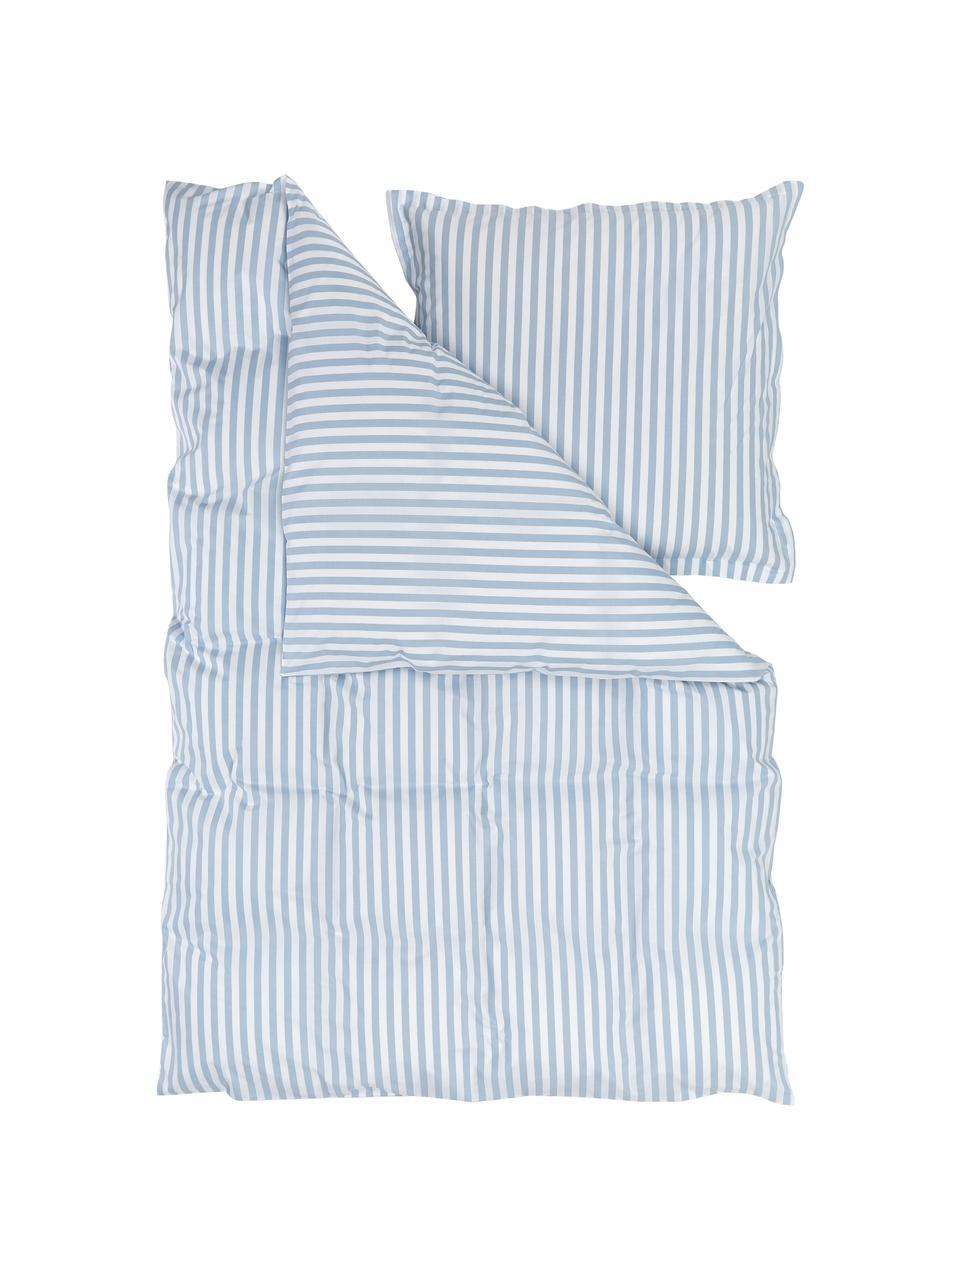 Gestreifte Baumwollperkal-Bettwäsche Yuliya Hellblau/Weiß, Webart: Perkal Fadendichte 180 TC, Blau, Weiß, 240 x 220 cm + 2 Kissen 80 x 80 cm